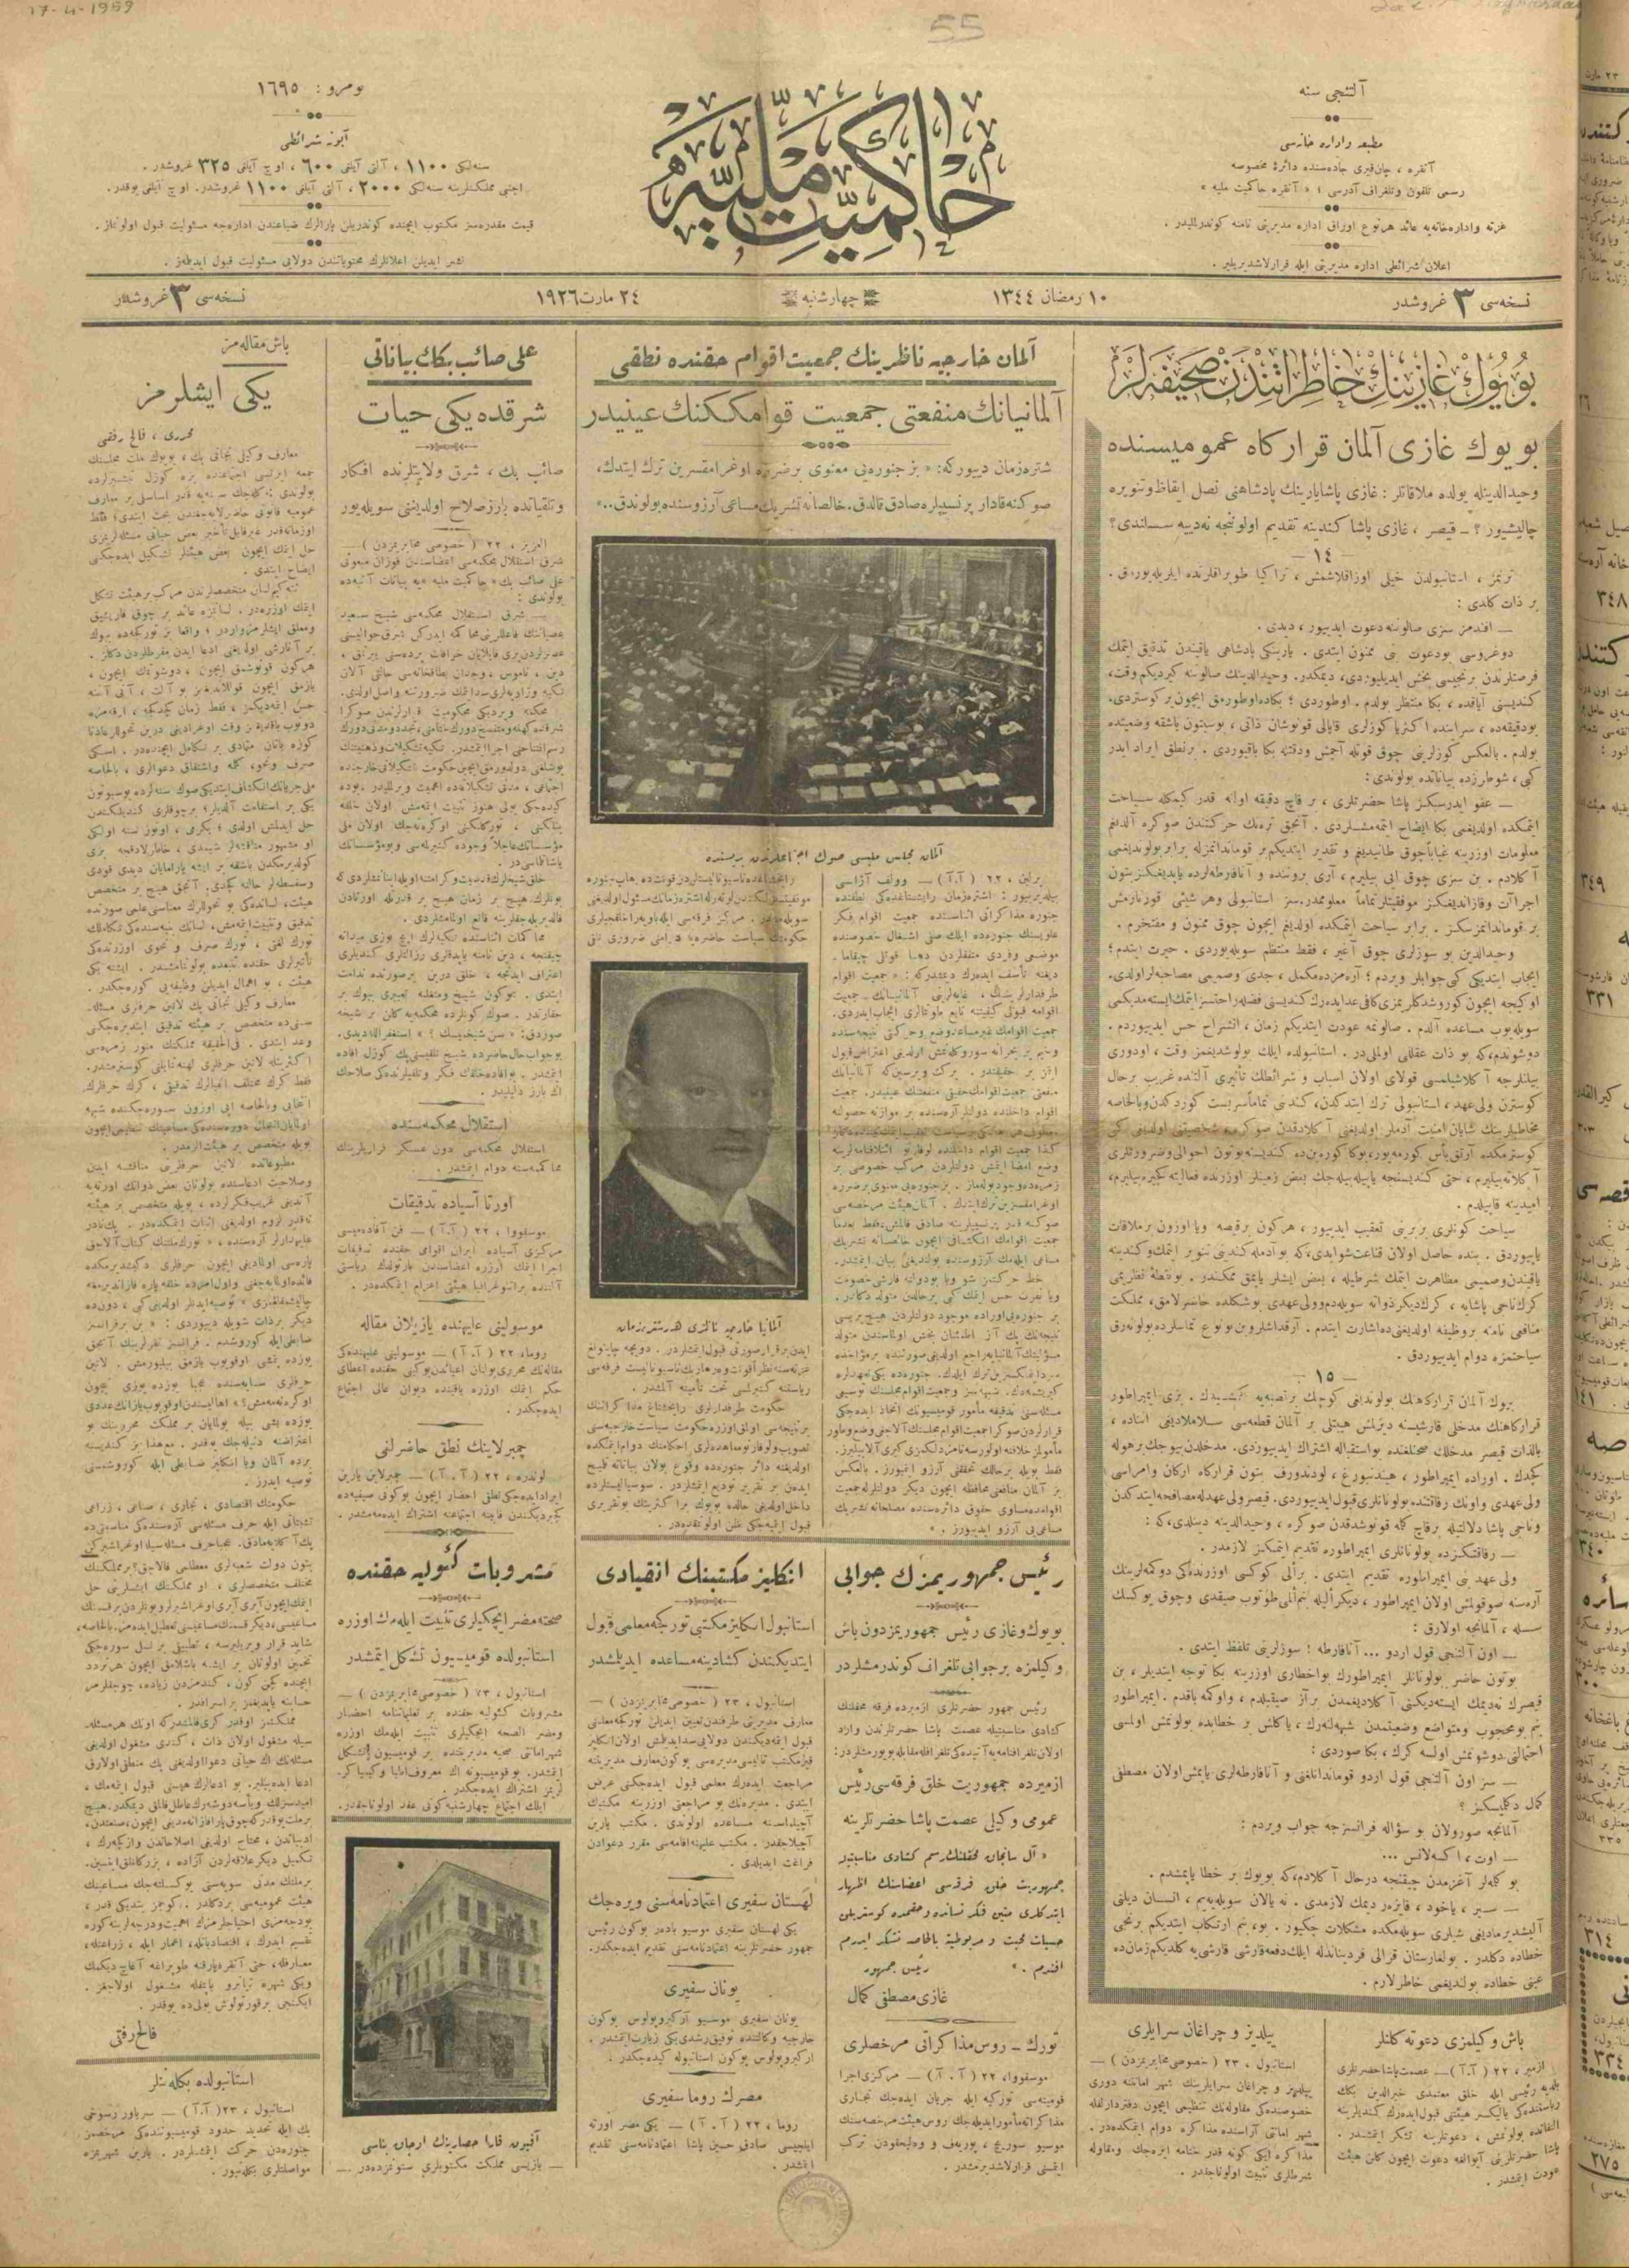 24 Mart 1926 Tarihli Hakimiyet-i Milliye Gazetesi Sayfa 1